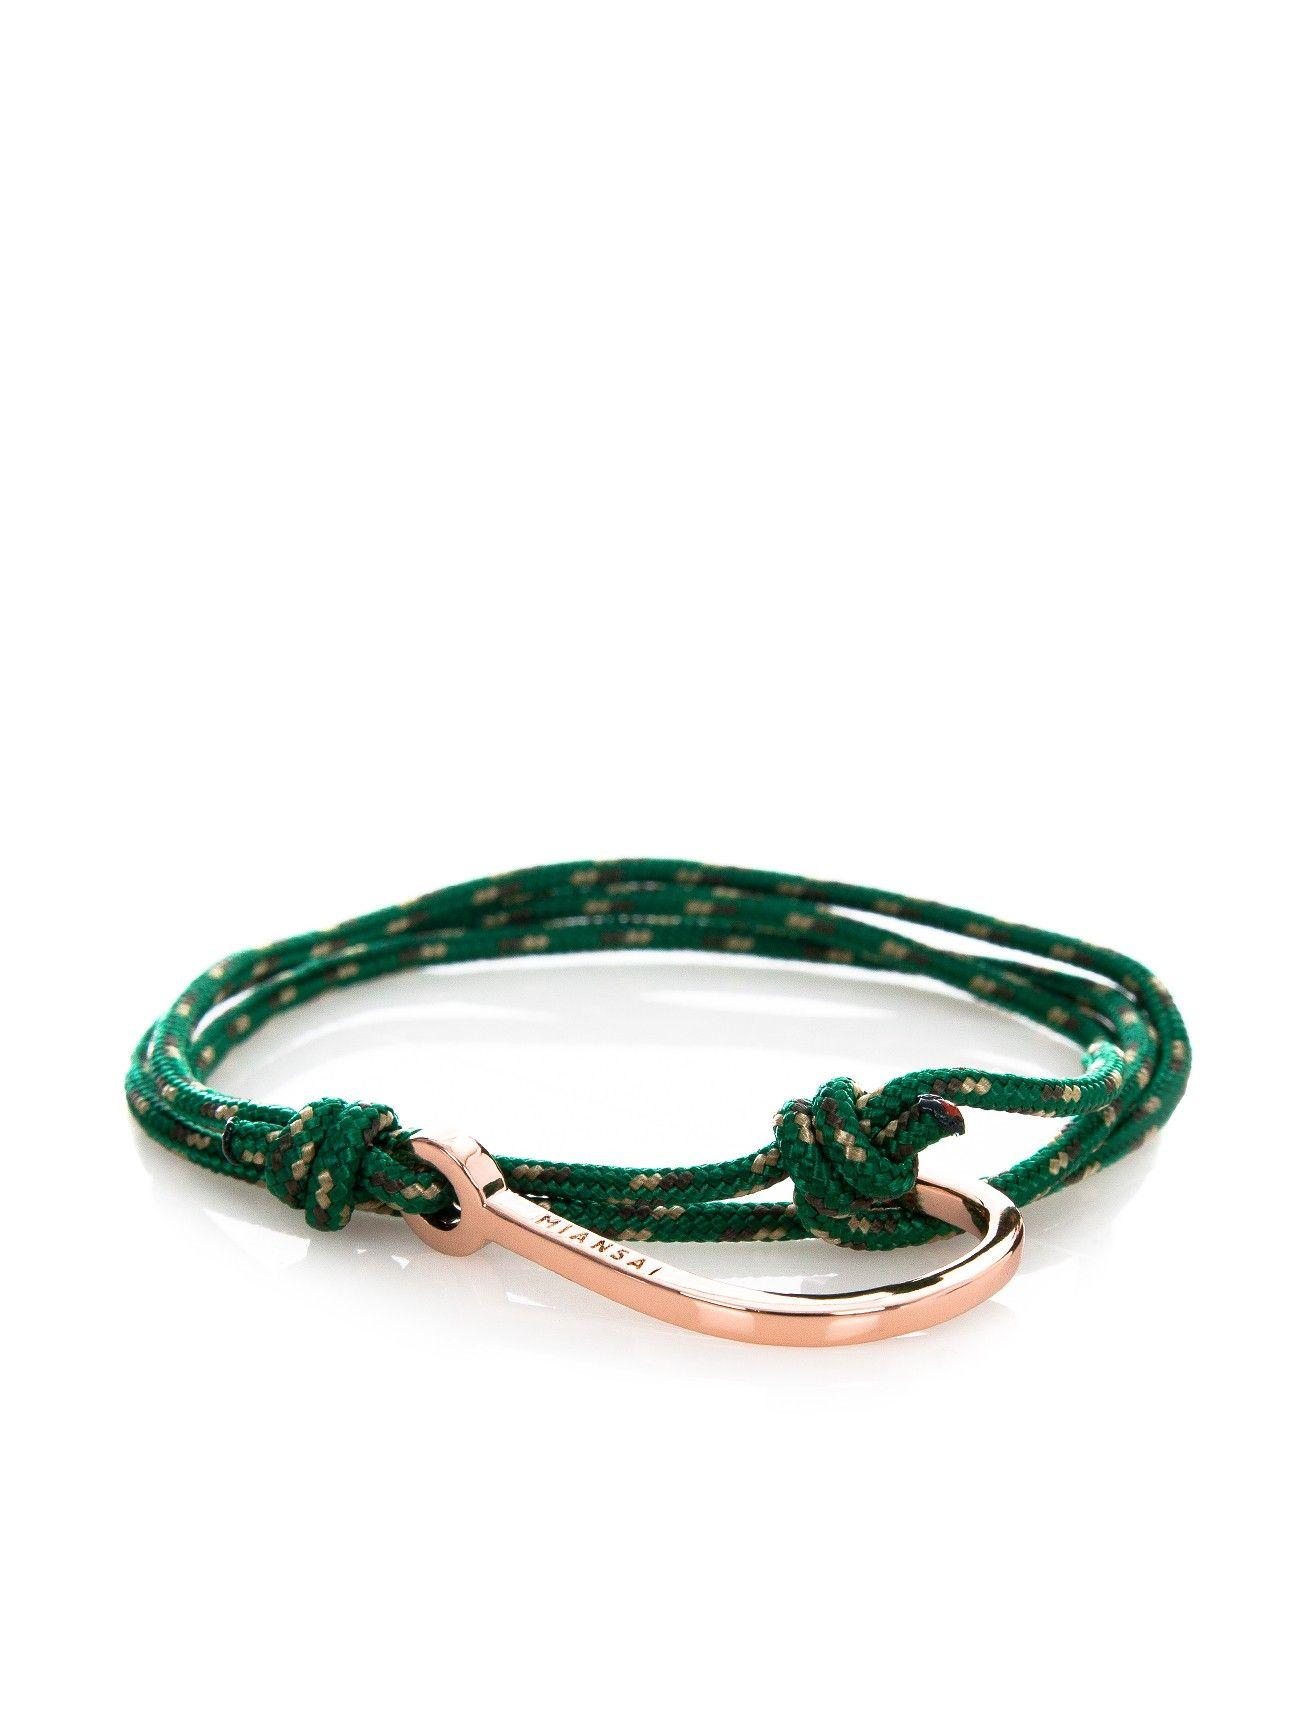 Scoop nyc miansai rope bracelet gold hook men gifts